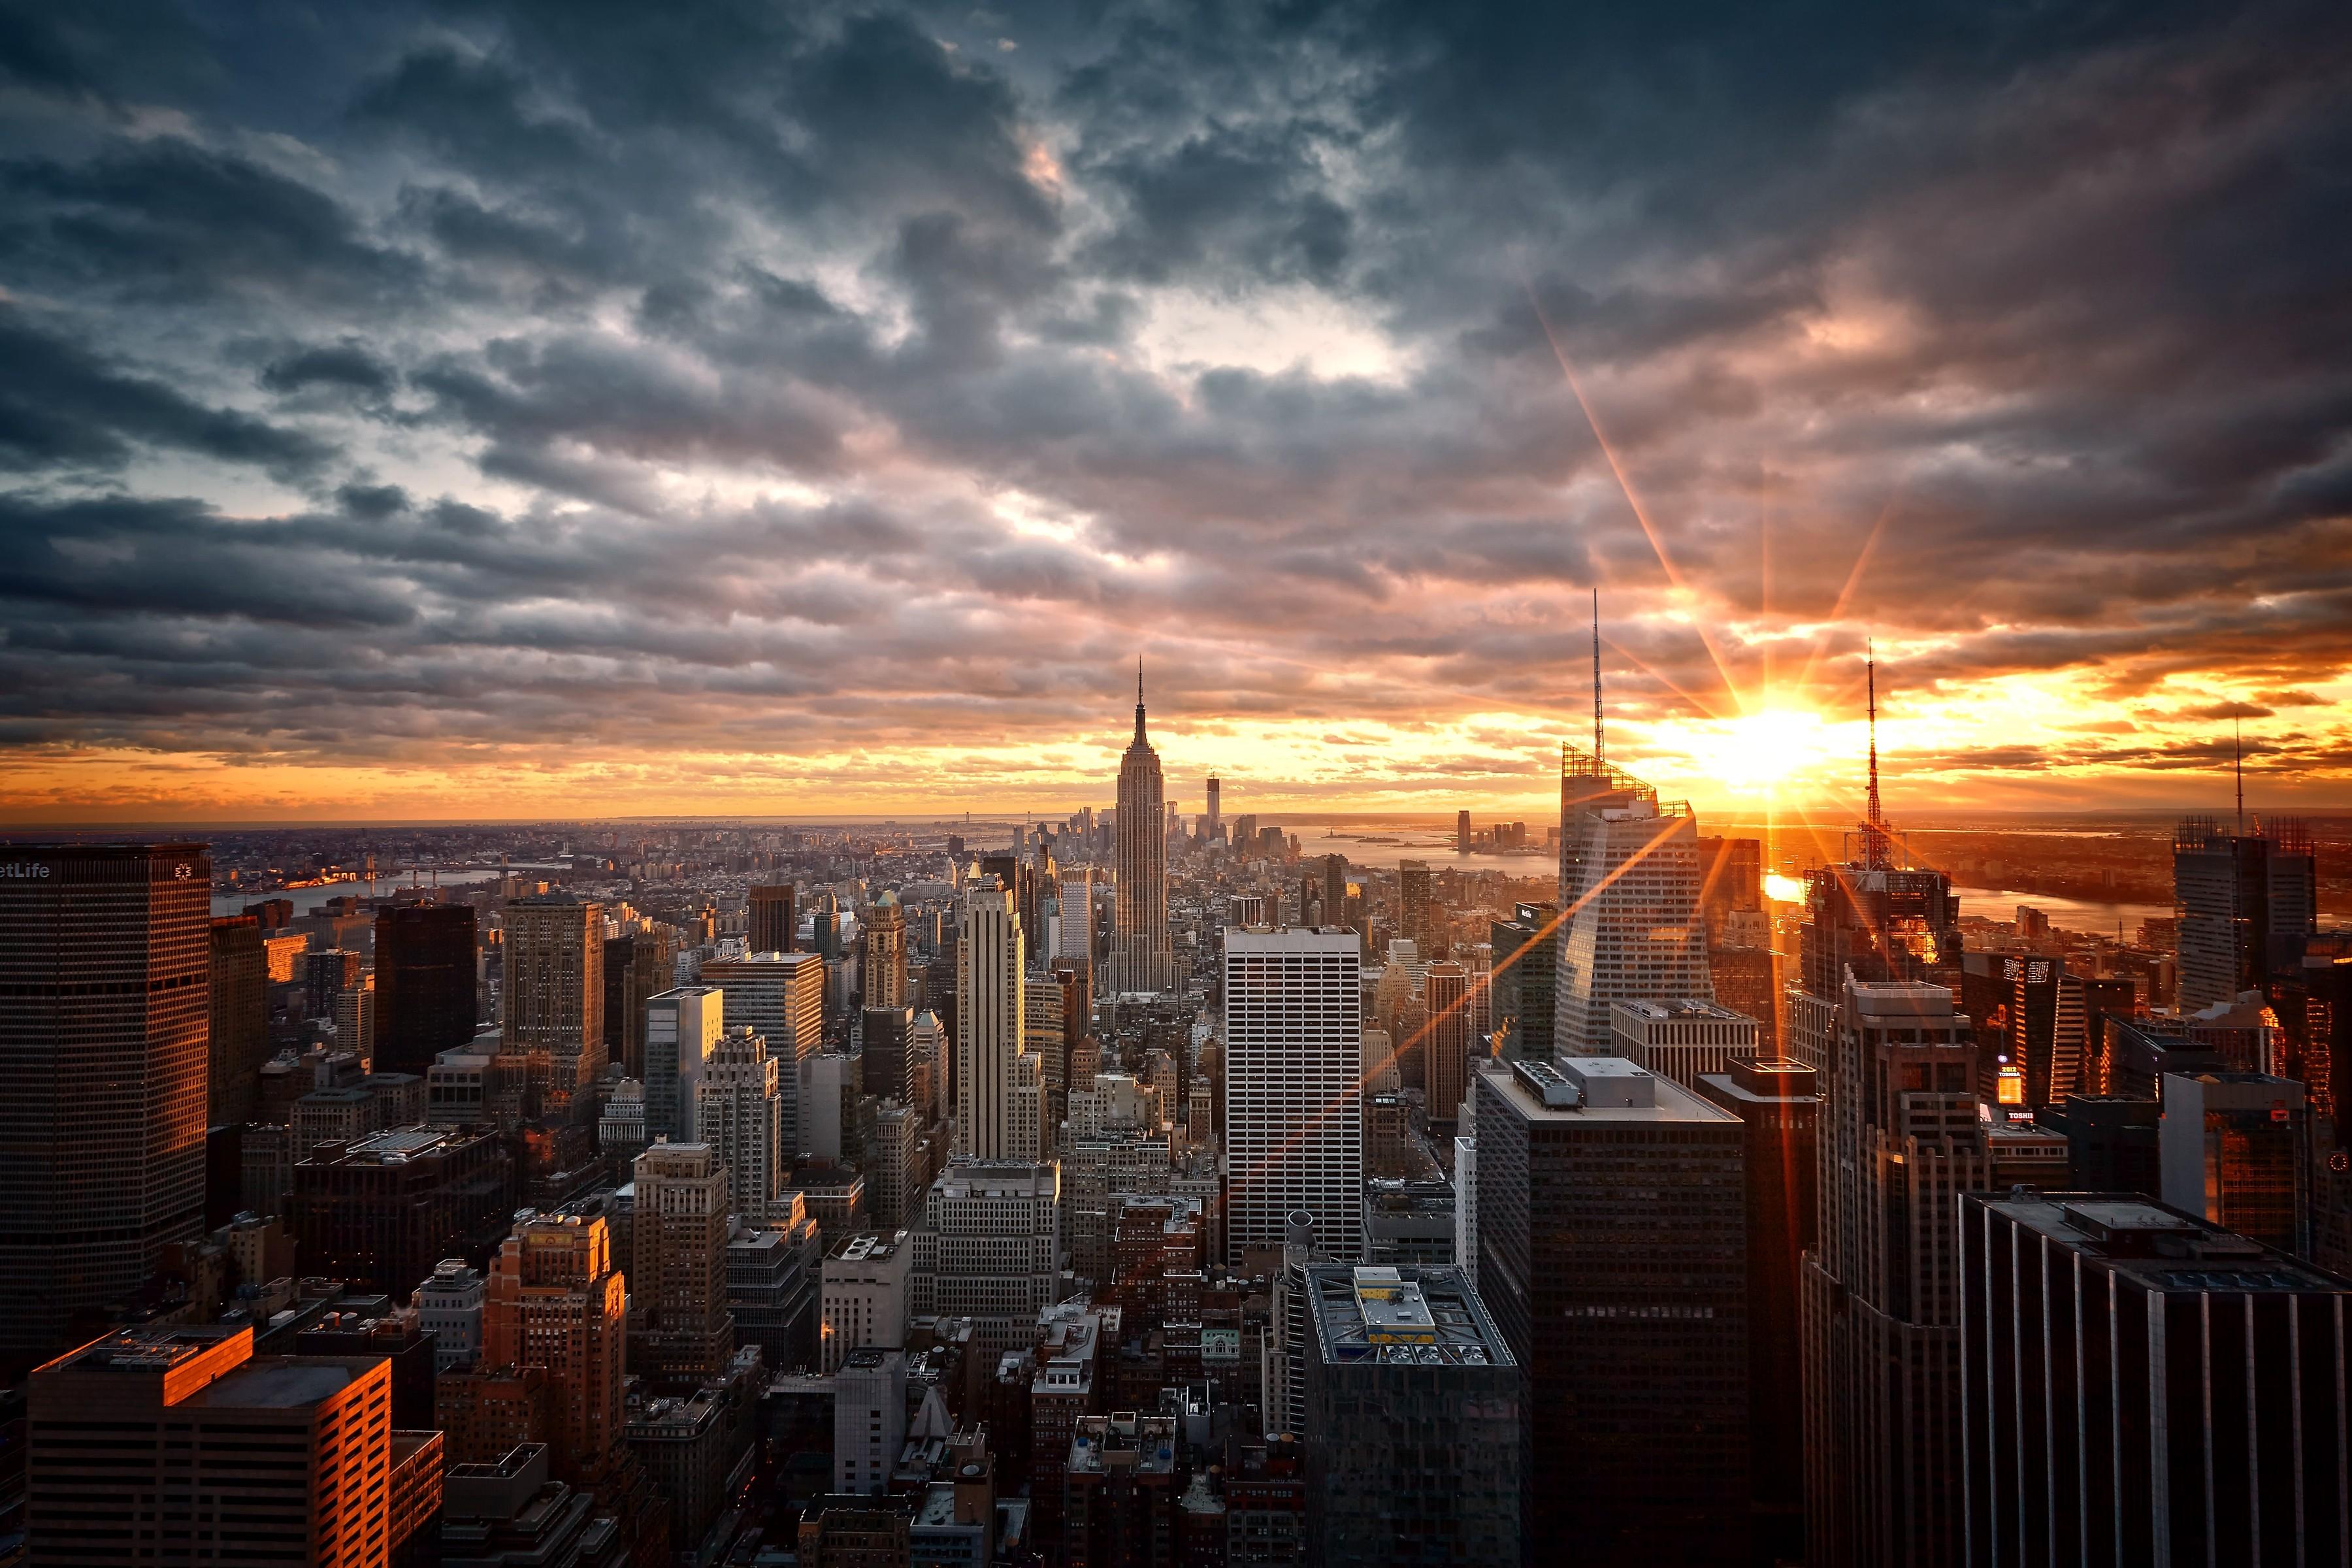 картинки город на восходе солнца исторических